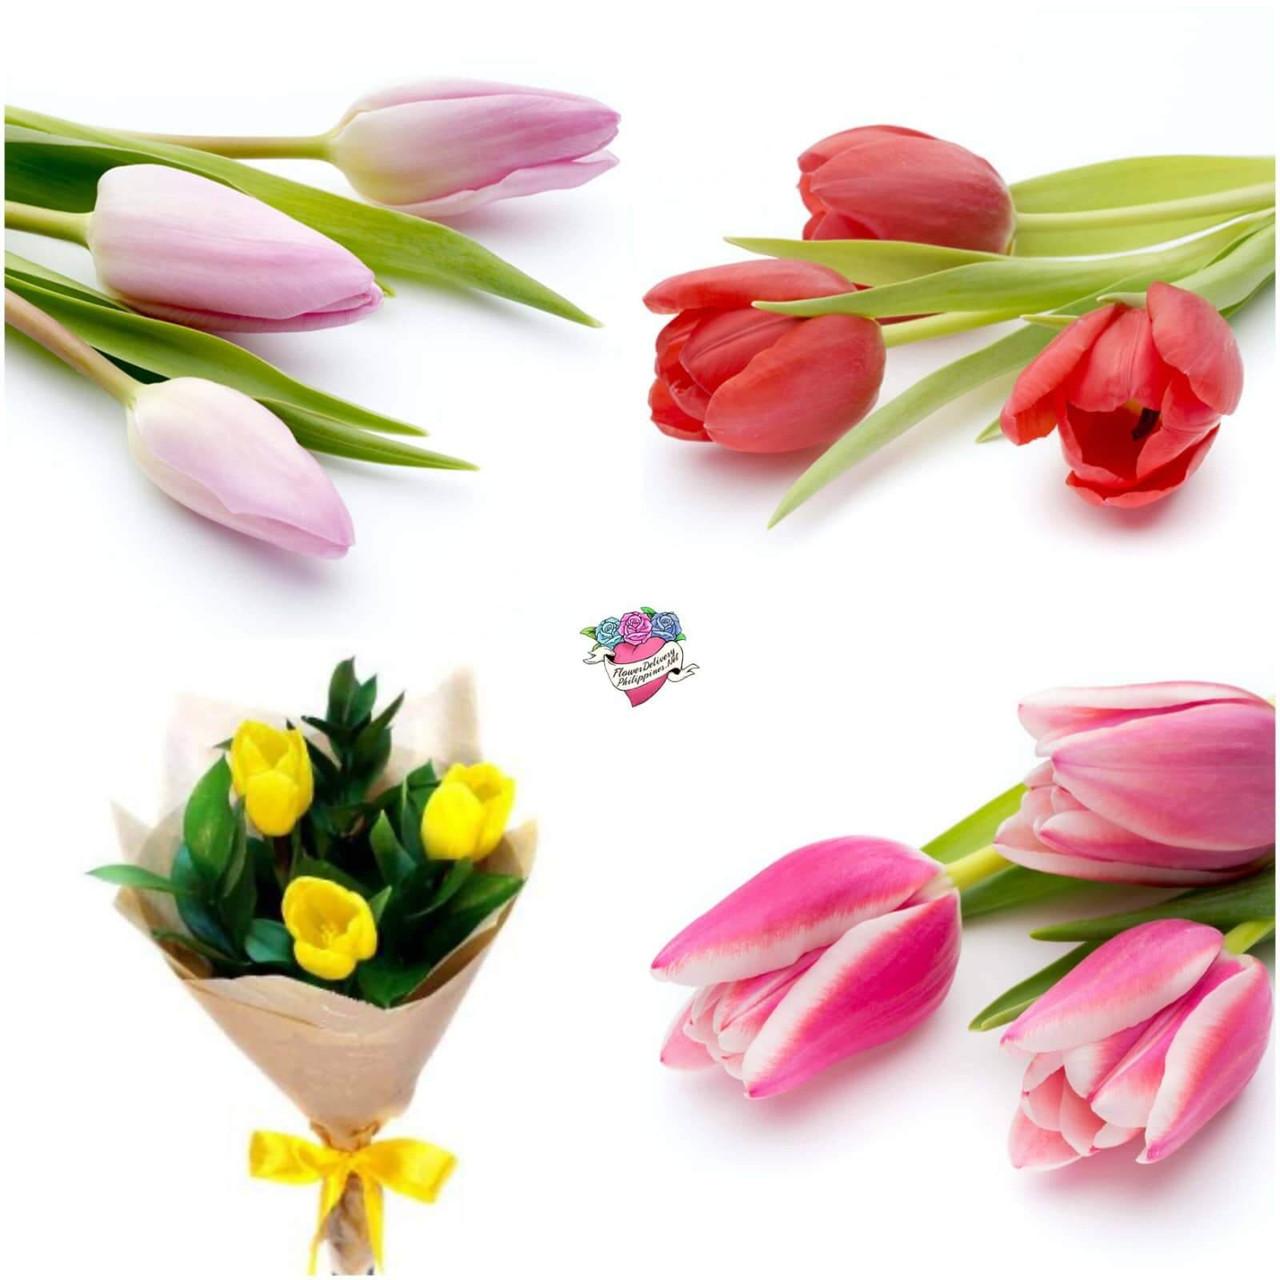 3 Tulips bouquet - Choose Tulips color!